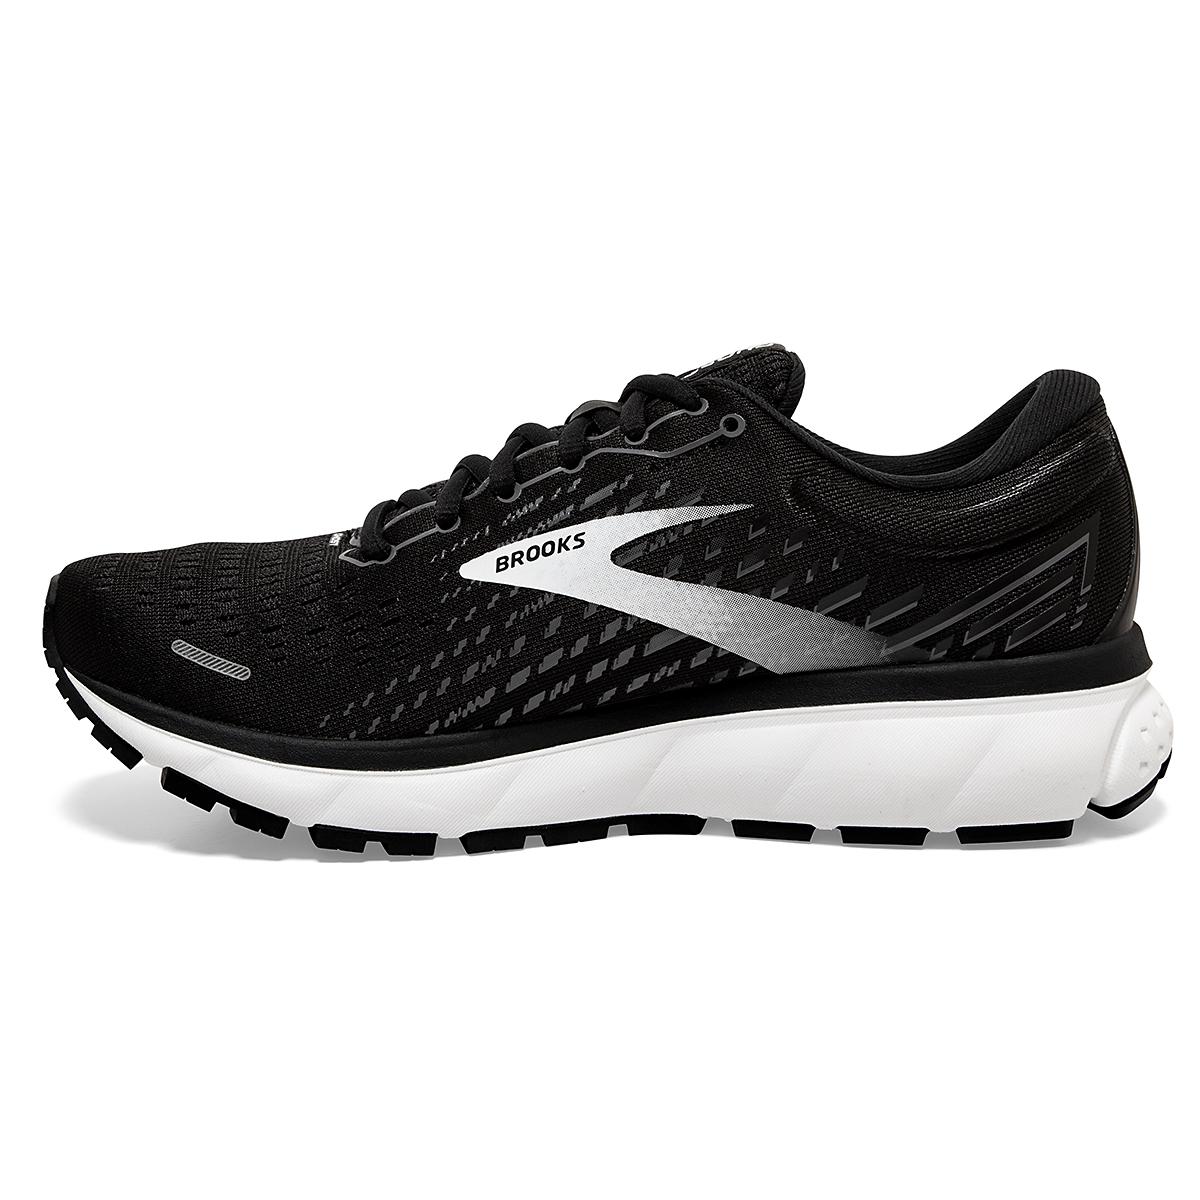 Women's Brooks Ghost 13 Running Shoe - Color: Black/Blackened - Size: 5 - Width: Regular, Black/Blackened, large, image 2